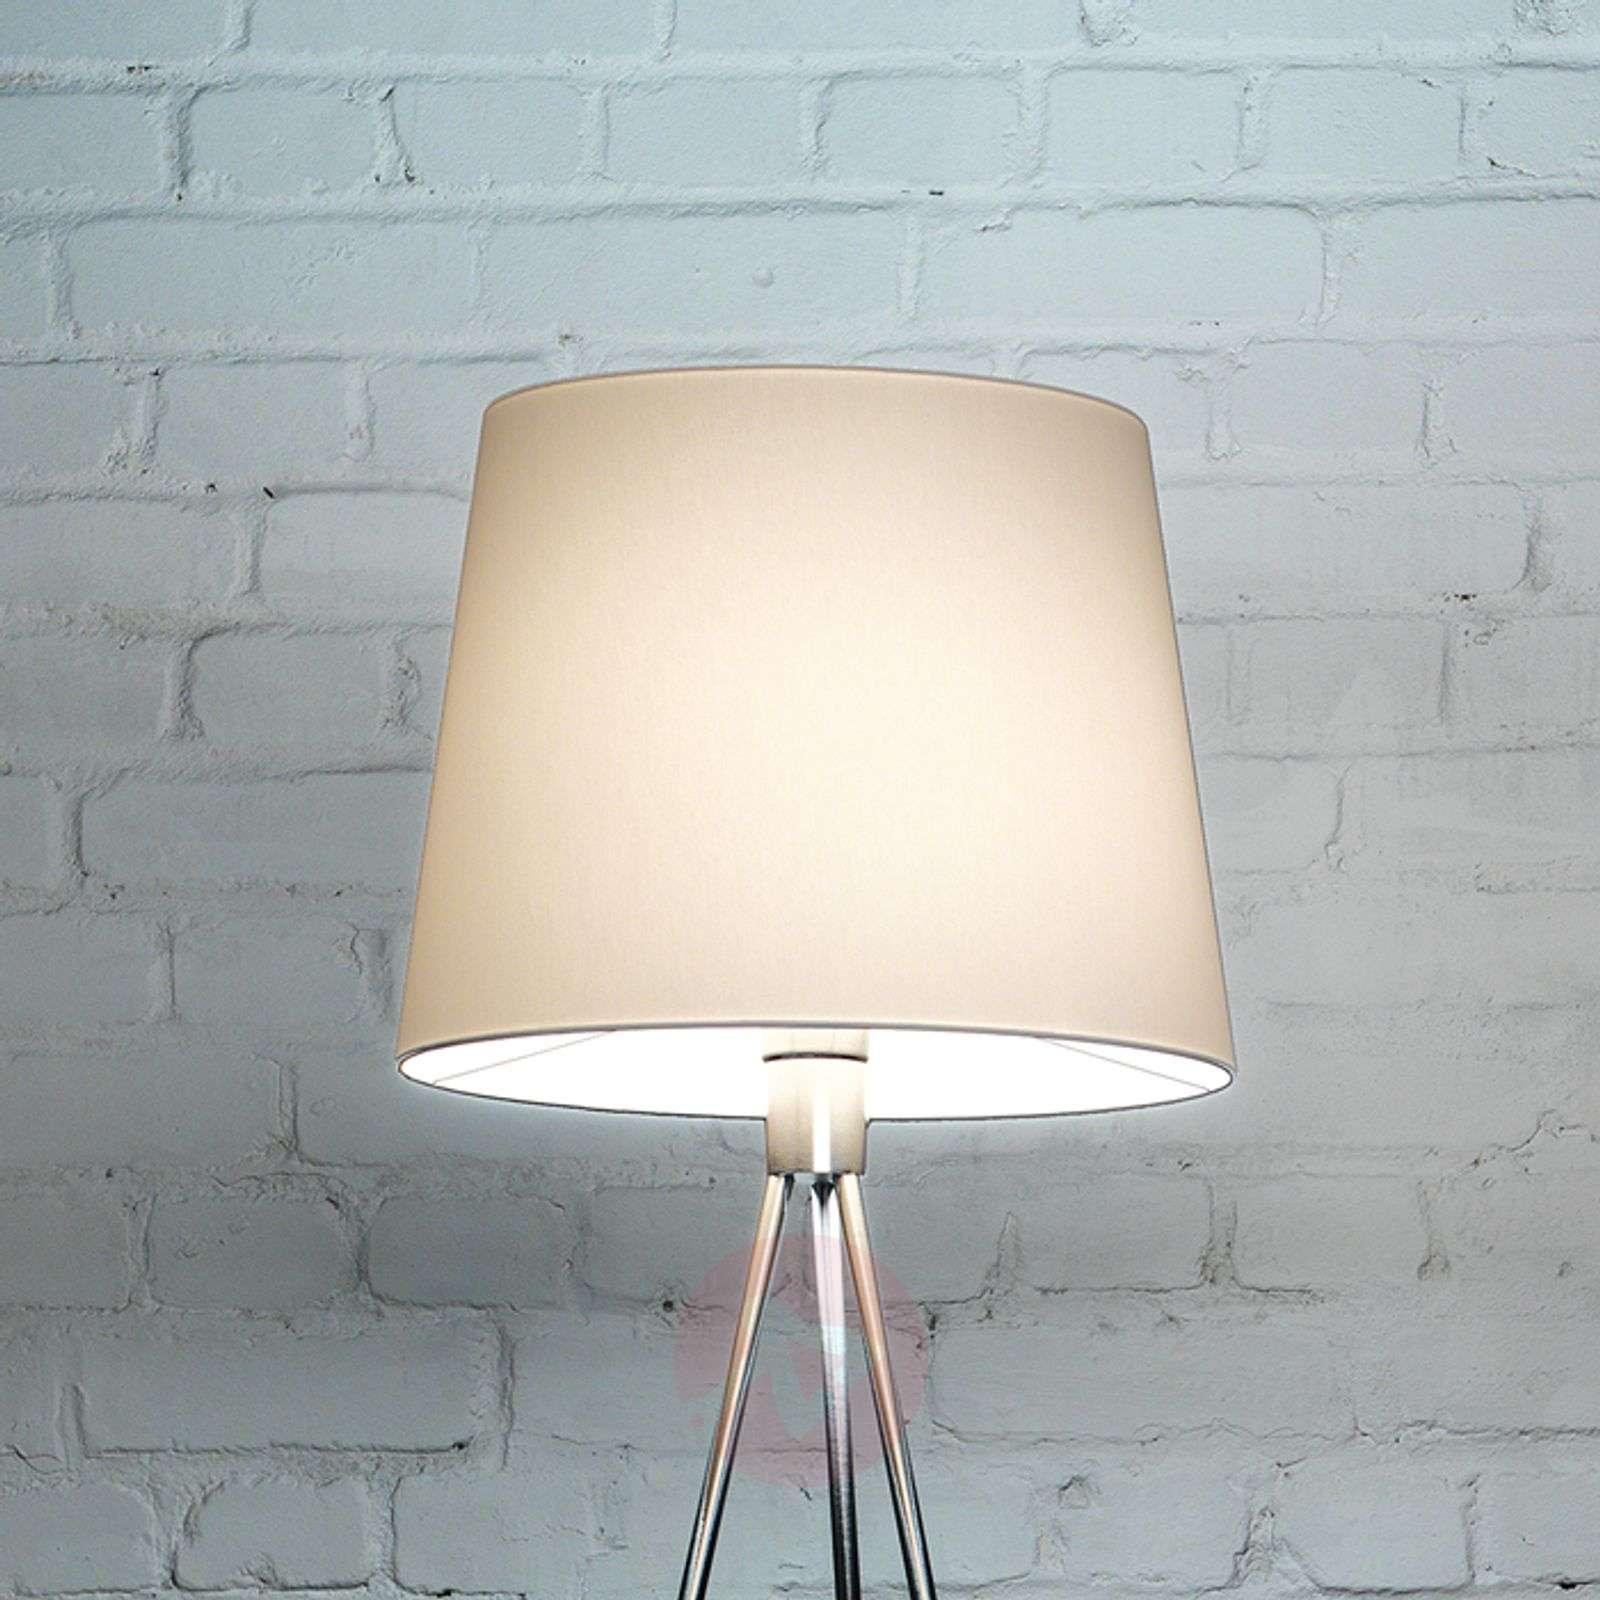 Three-legged floor lamp Pico-4002590X-01